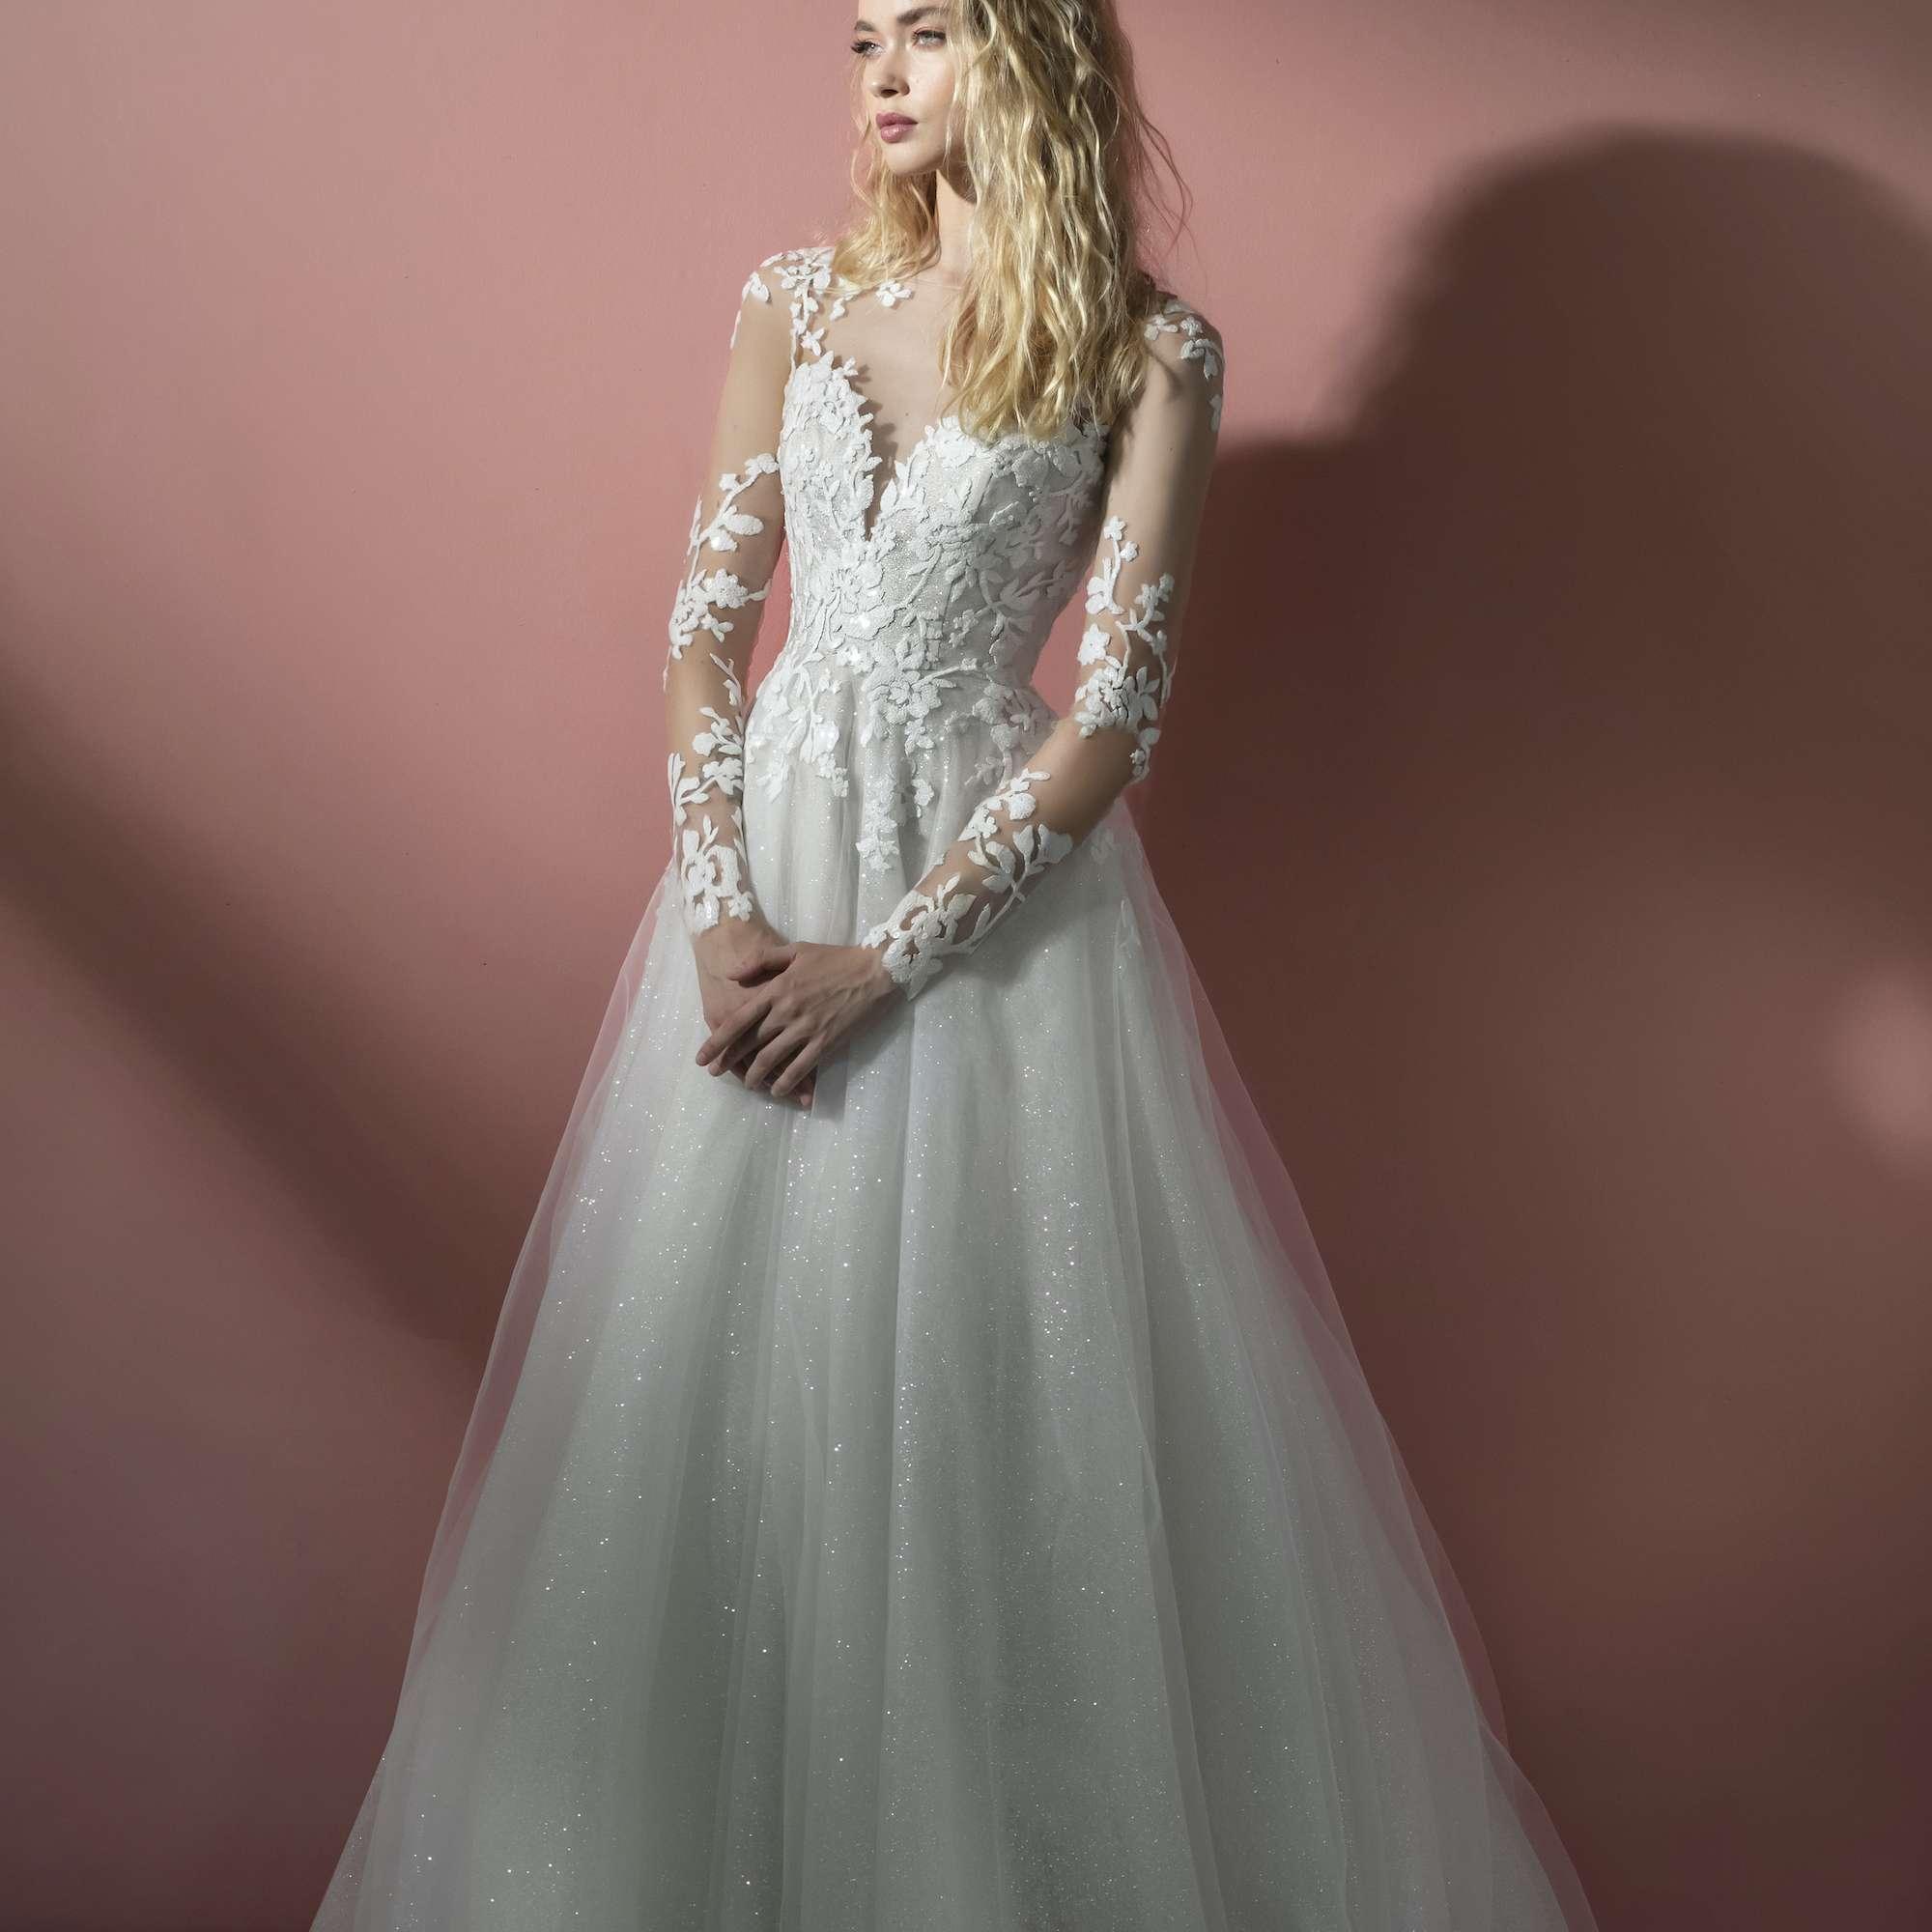 Augie long sleeve wedding dress